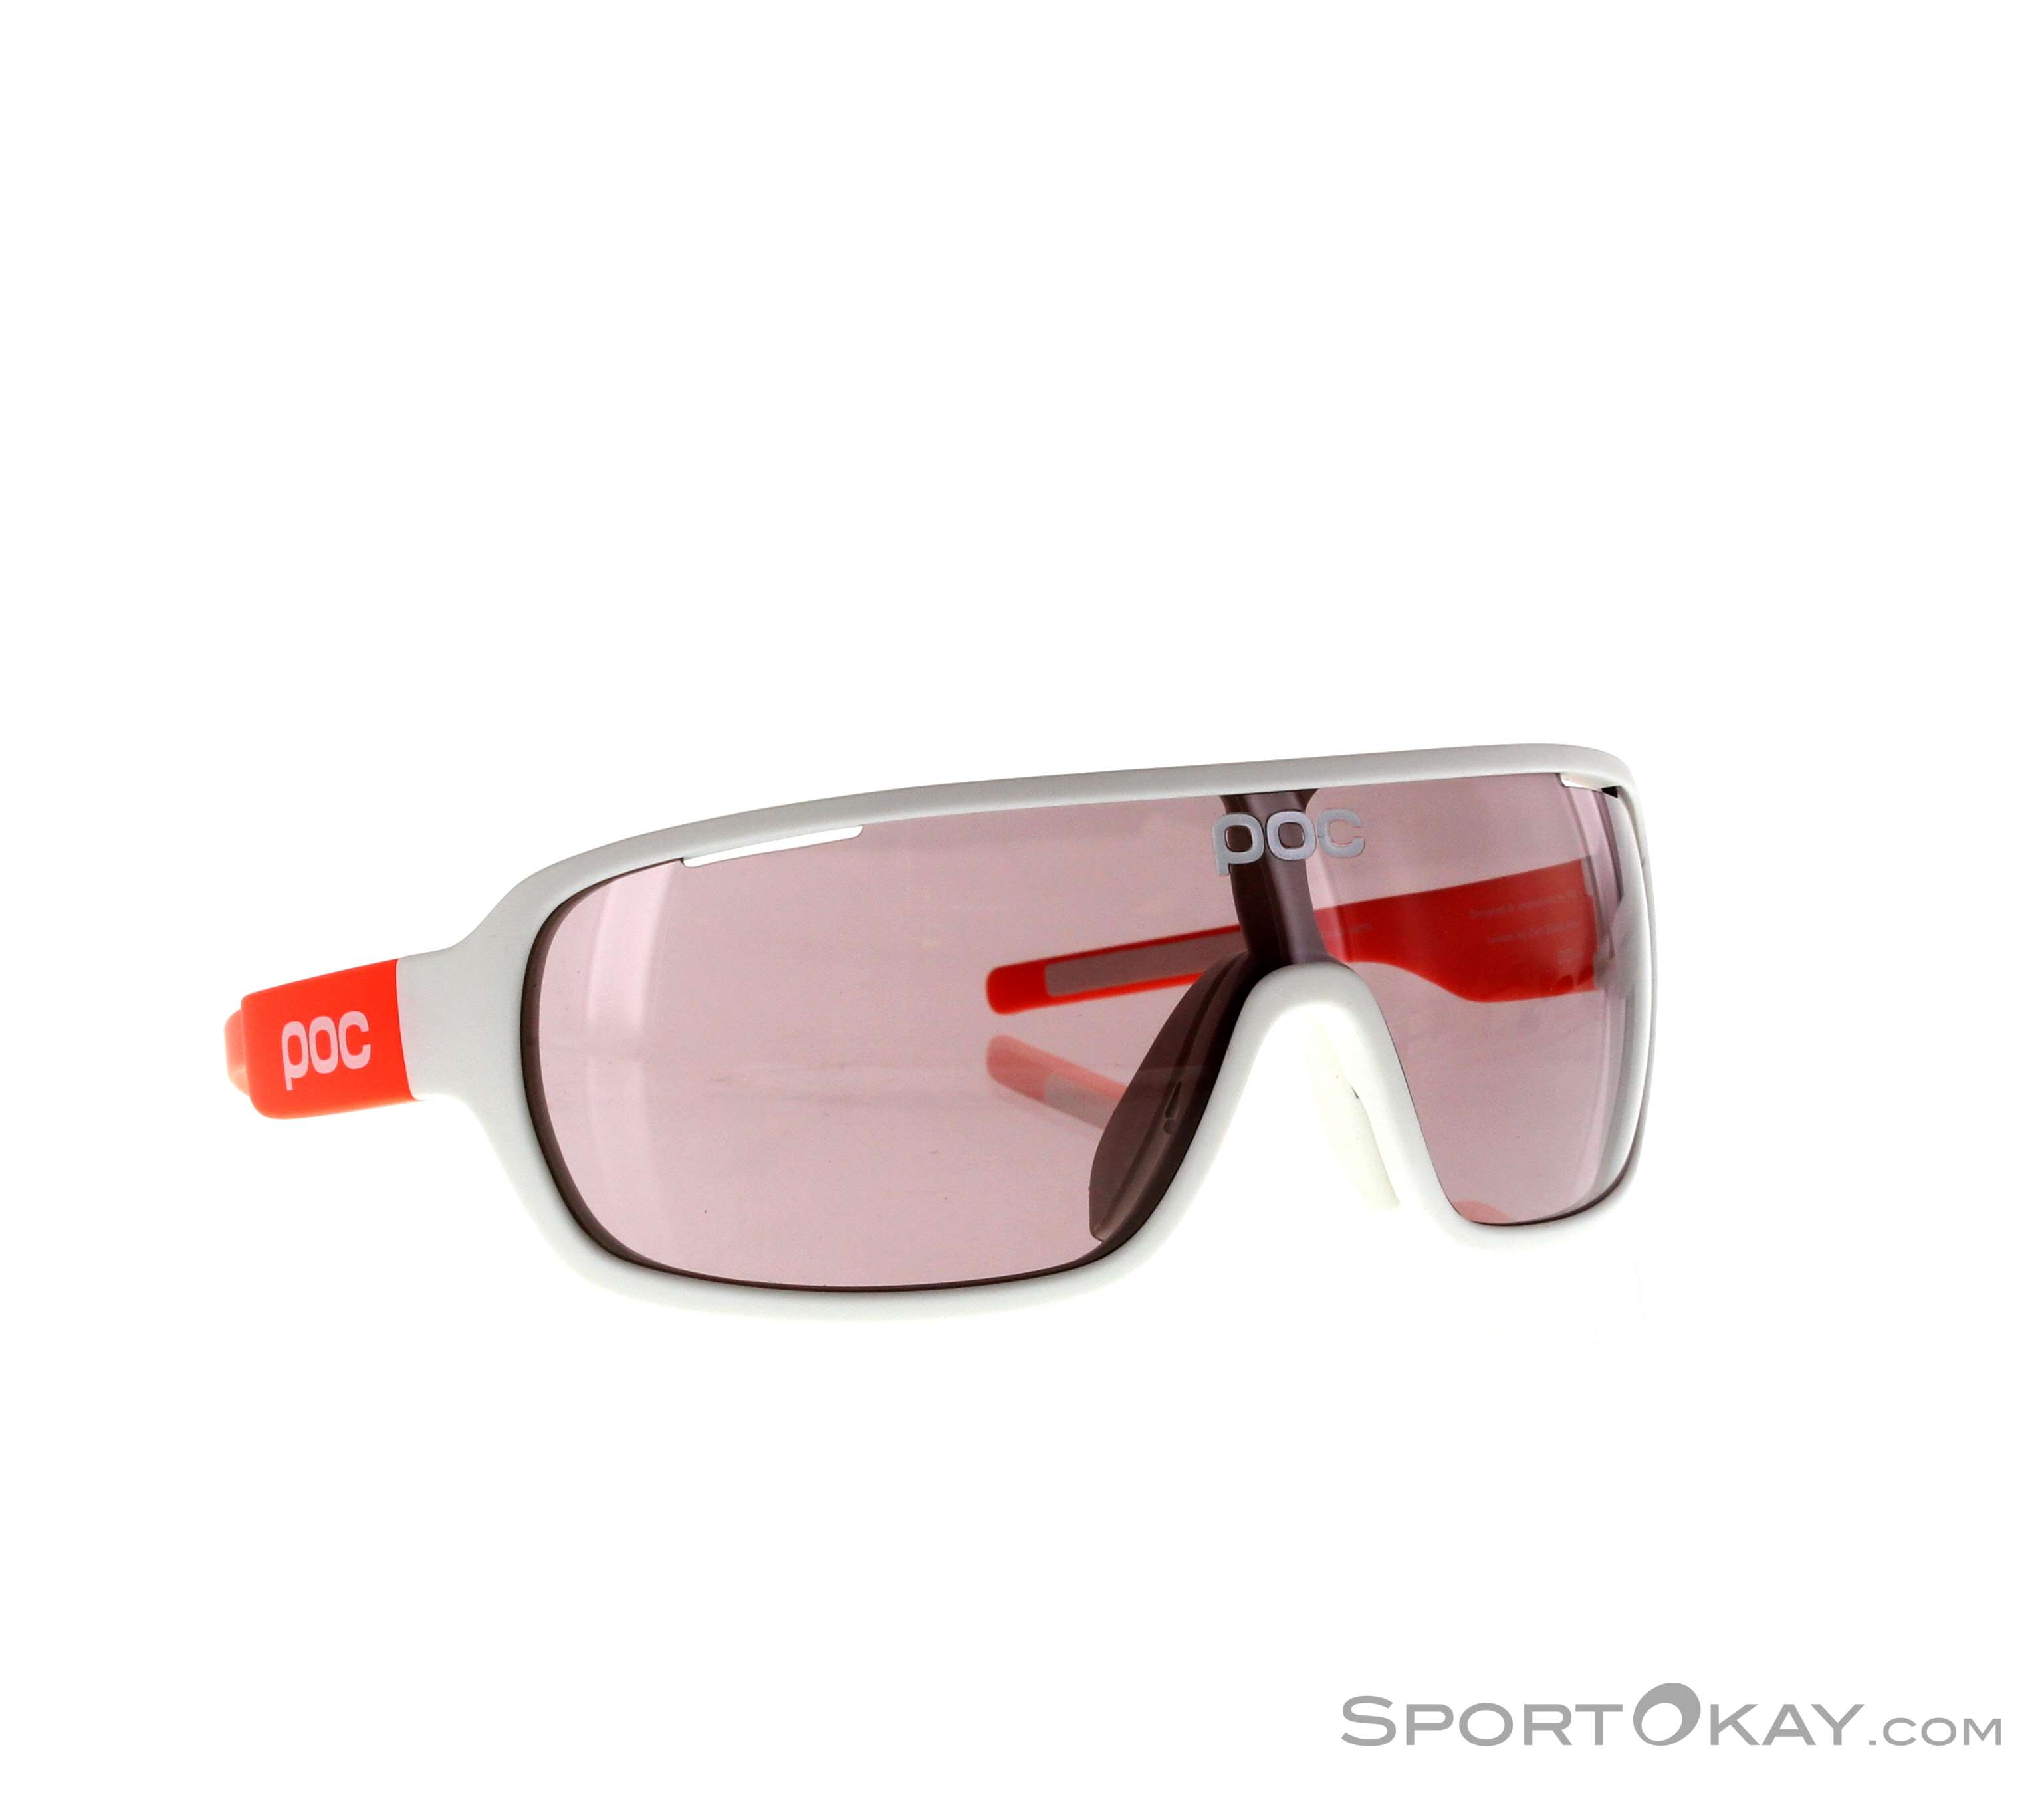 POC DO Blade AVIP Sportbrille SUFFNkW0